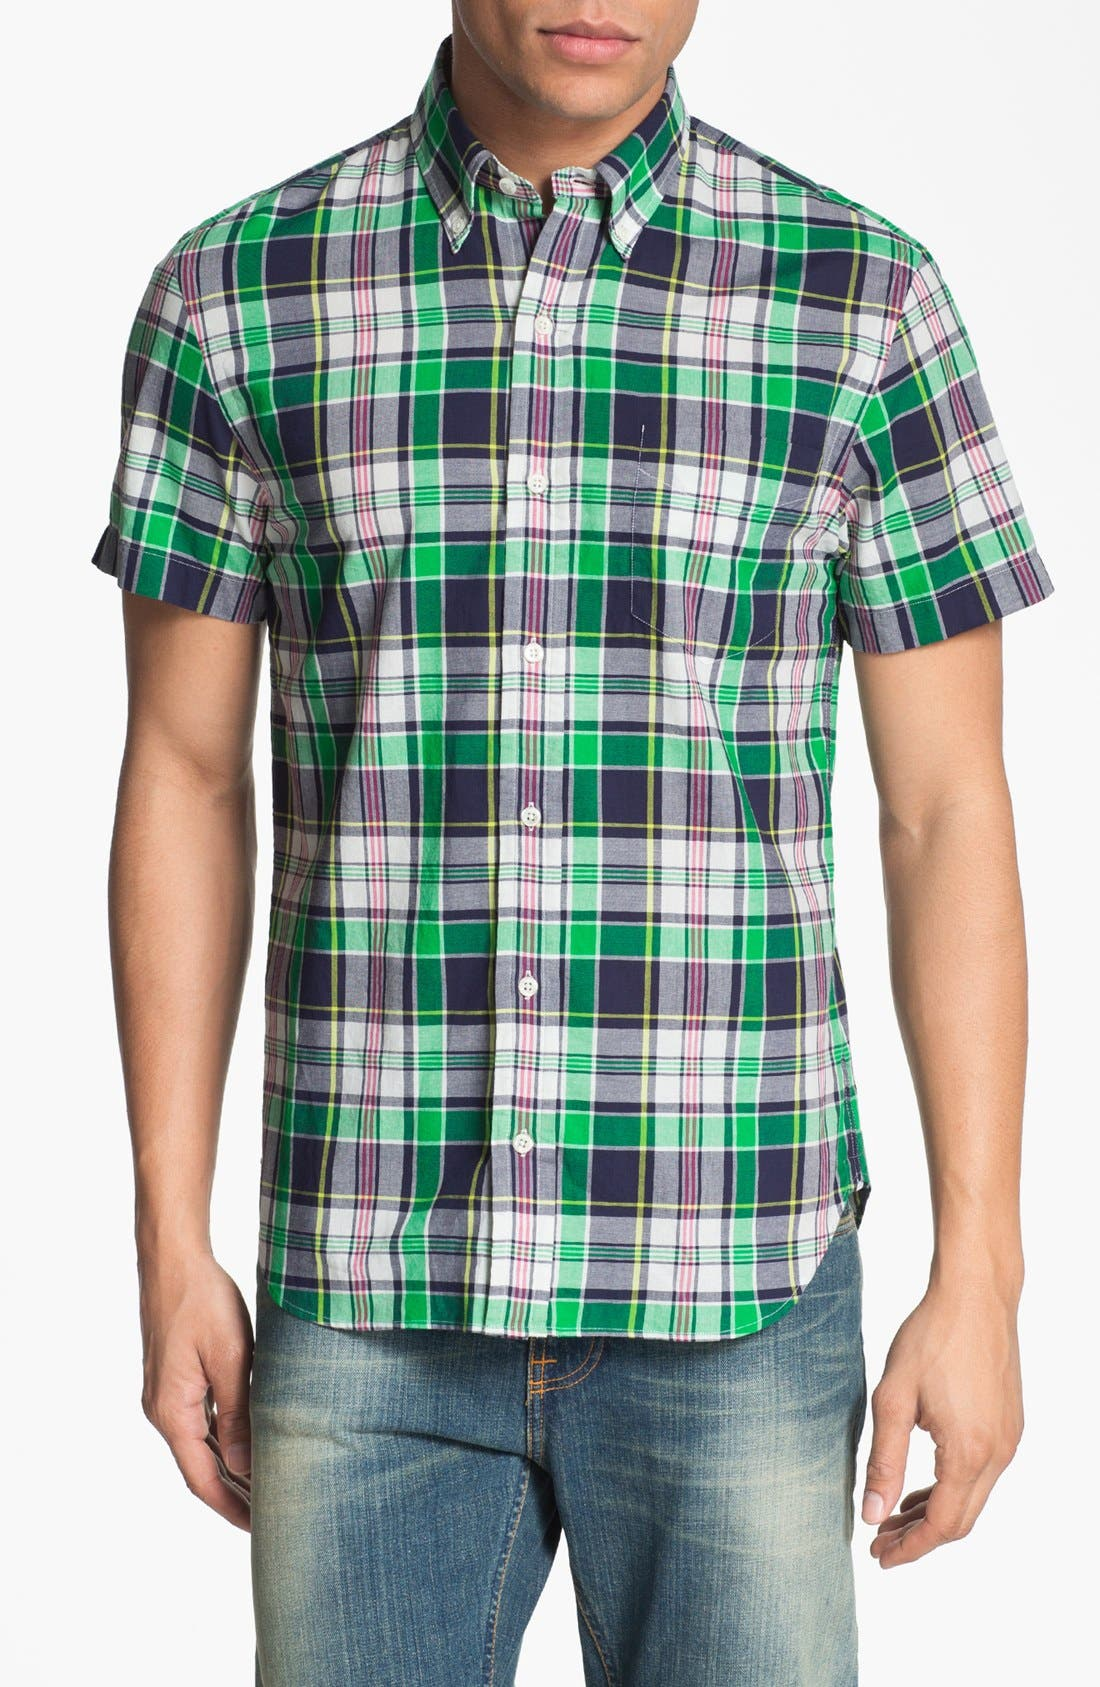 Alternate Image 1 Selected - J. Press York Street Short Sleeve Plaid Cotton Shirt